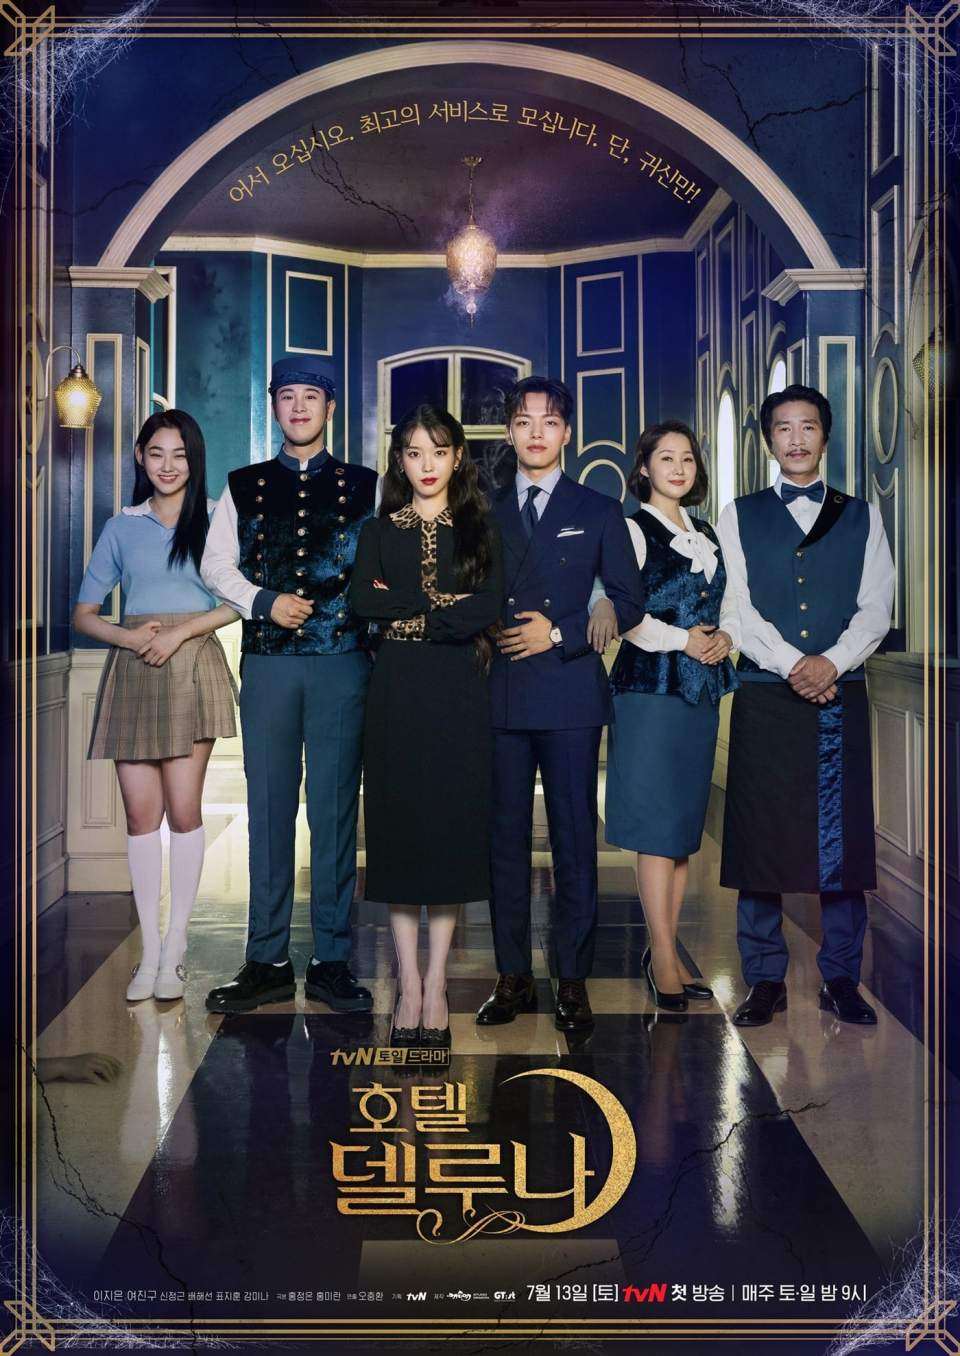 Hotel Del Luna1 - My Top 5 K-Drama Picks for Newbies